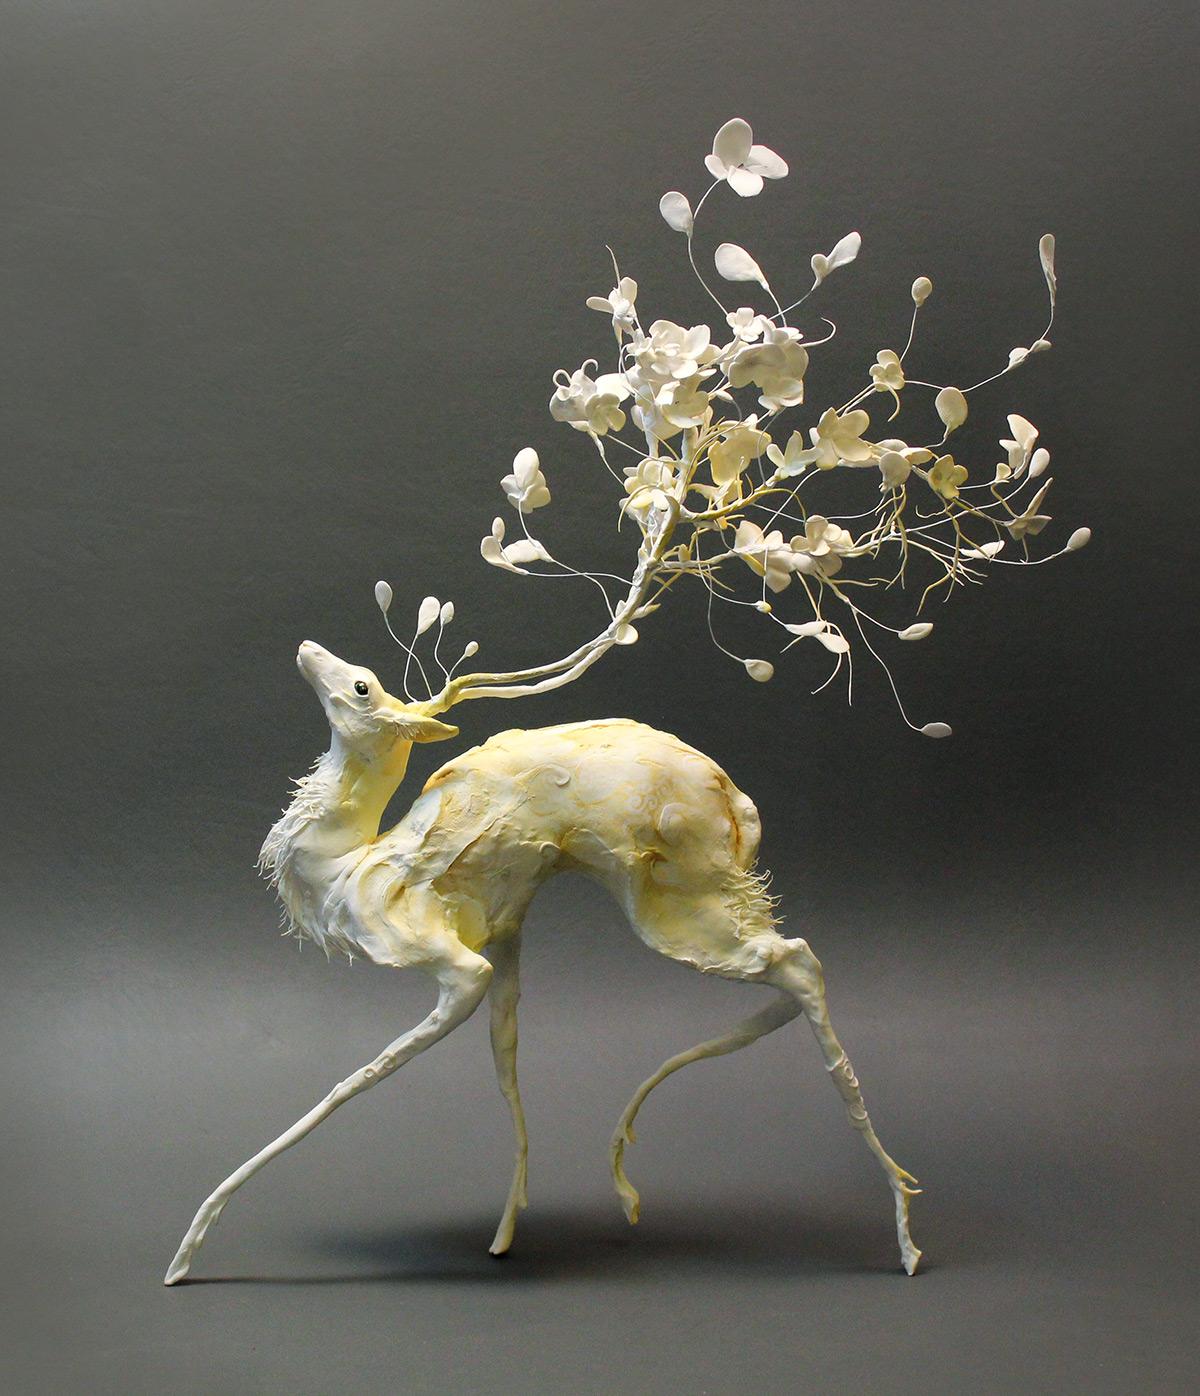 cervo-rami-sculture-surrealiste-ellen-jewett